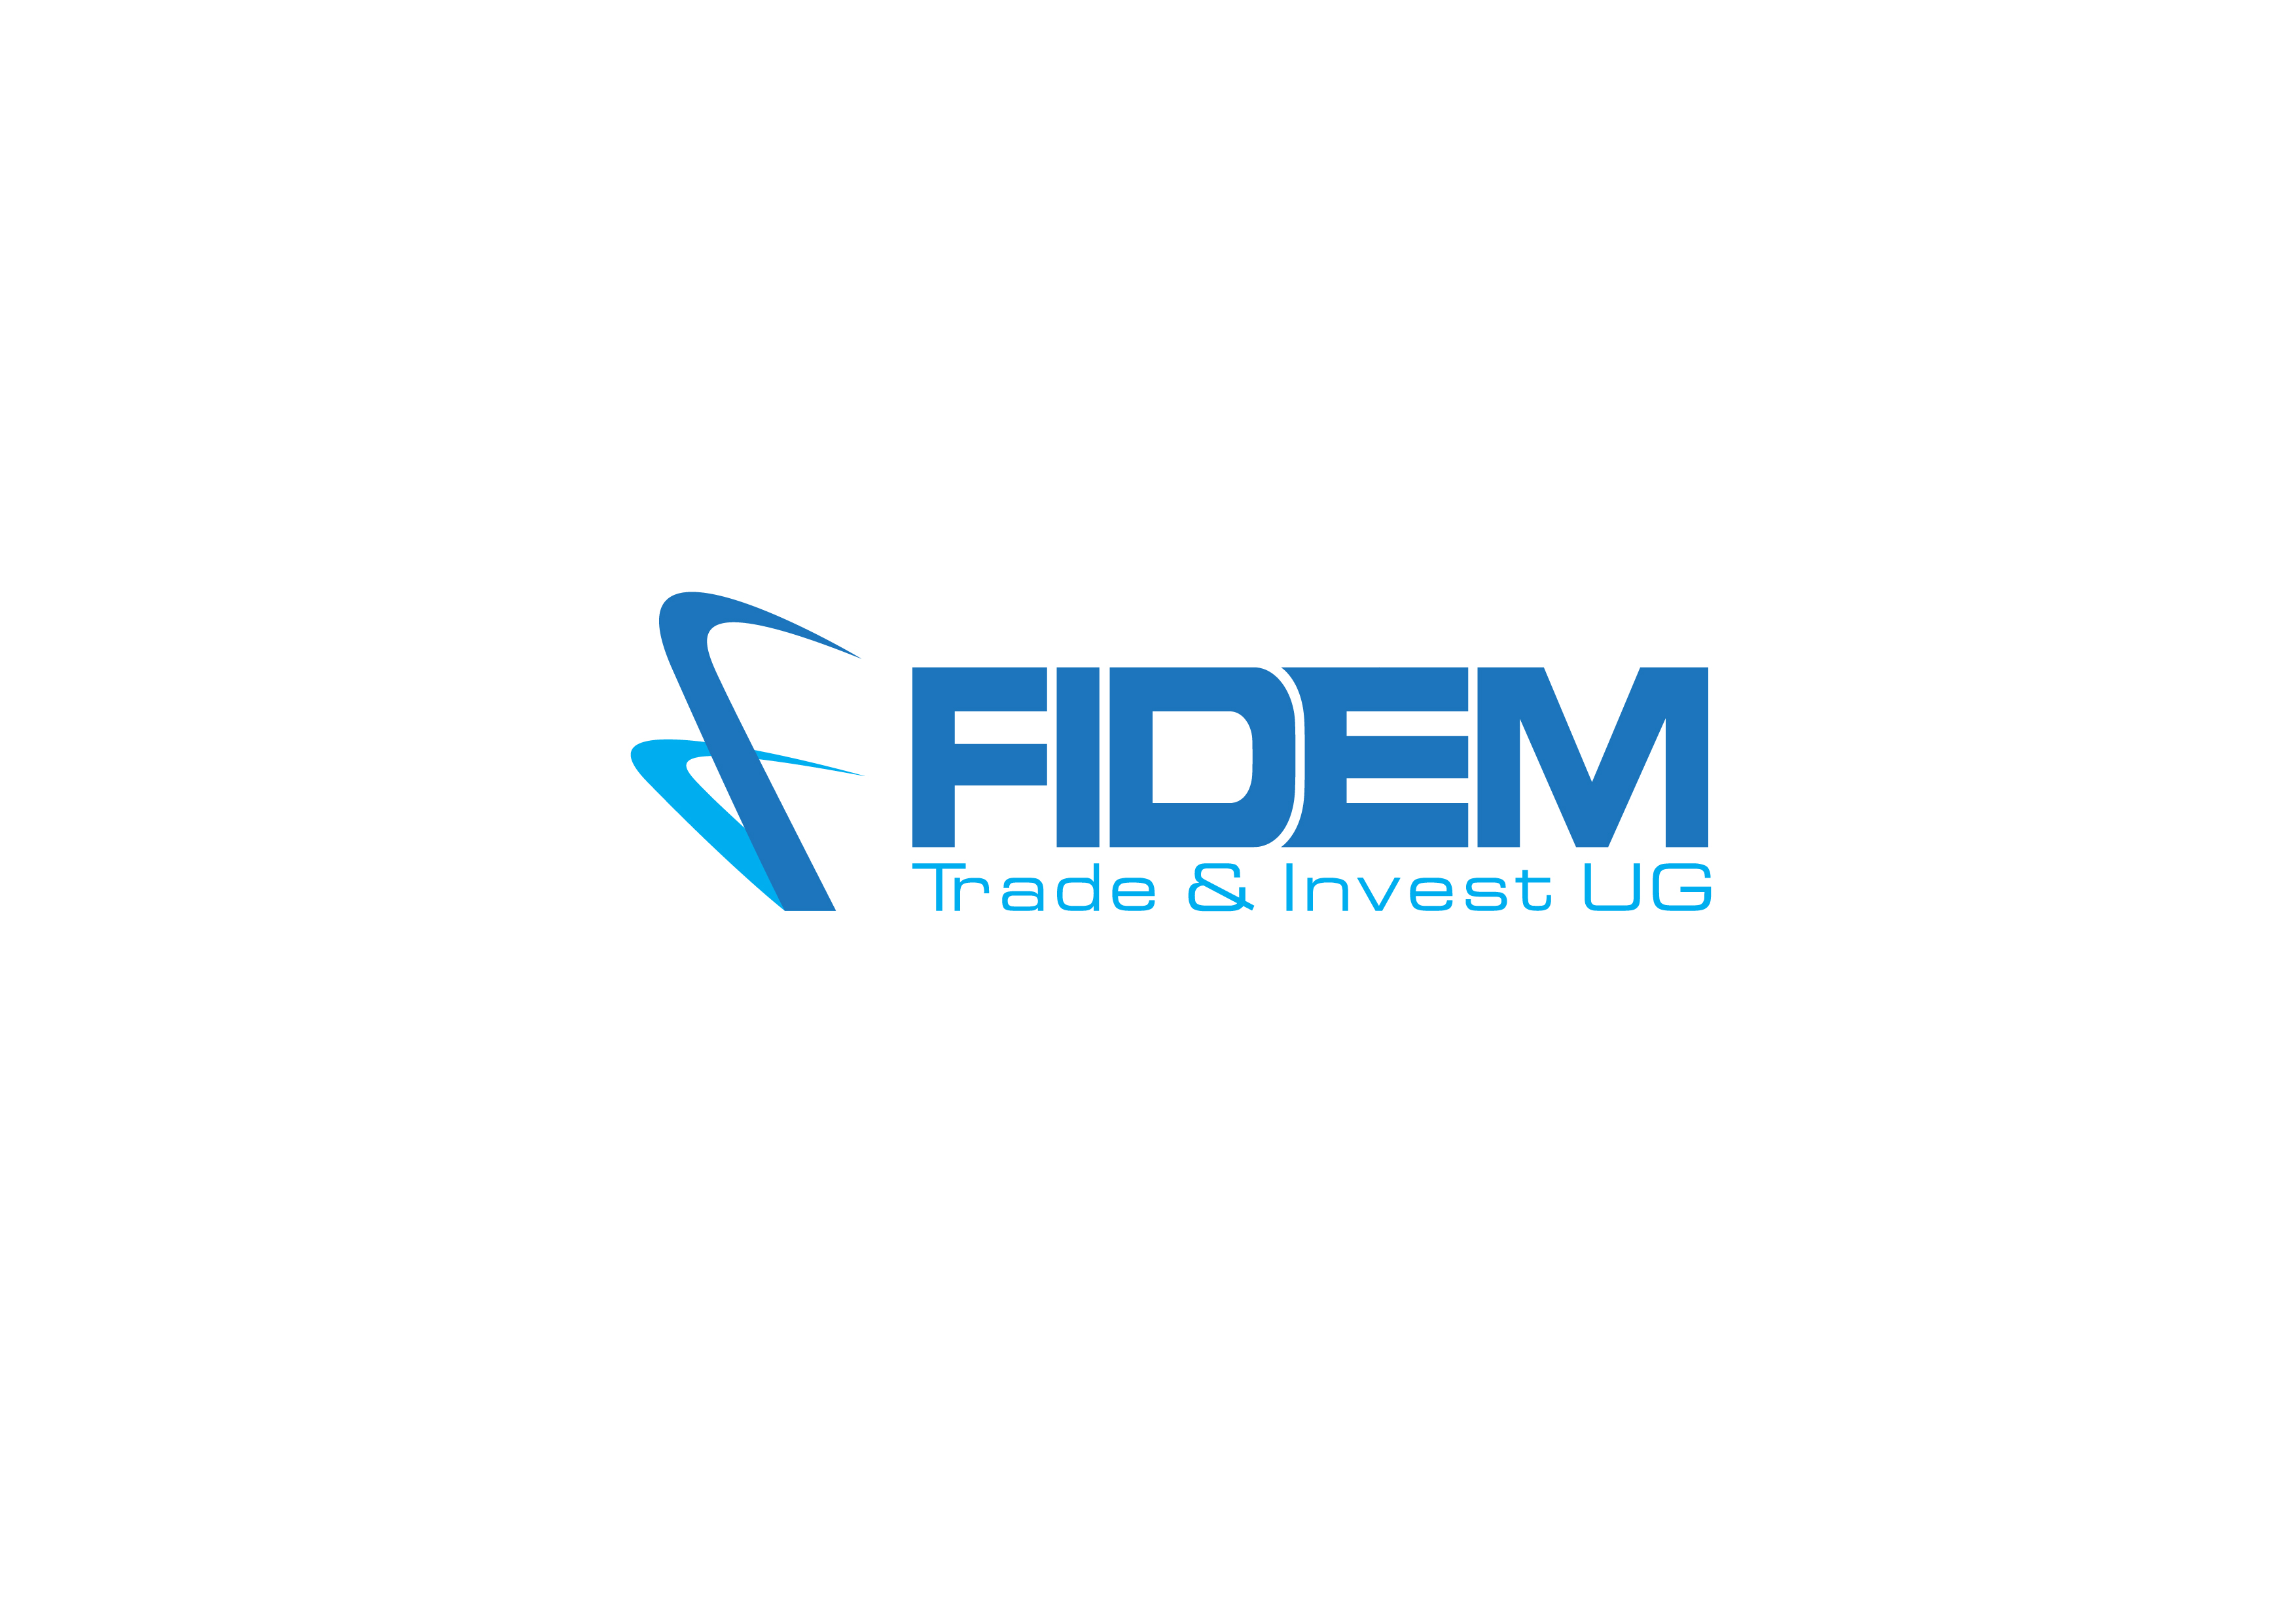 Logo Design by 3draw - Entry No. 707 in the Logo Design Contest Professional Logo Design for FIDEM Trade & Invest UG.